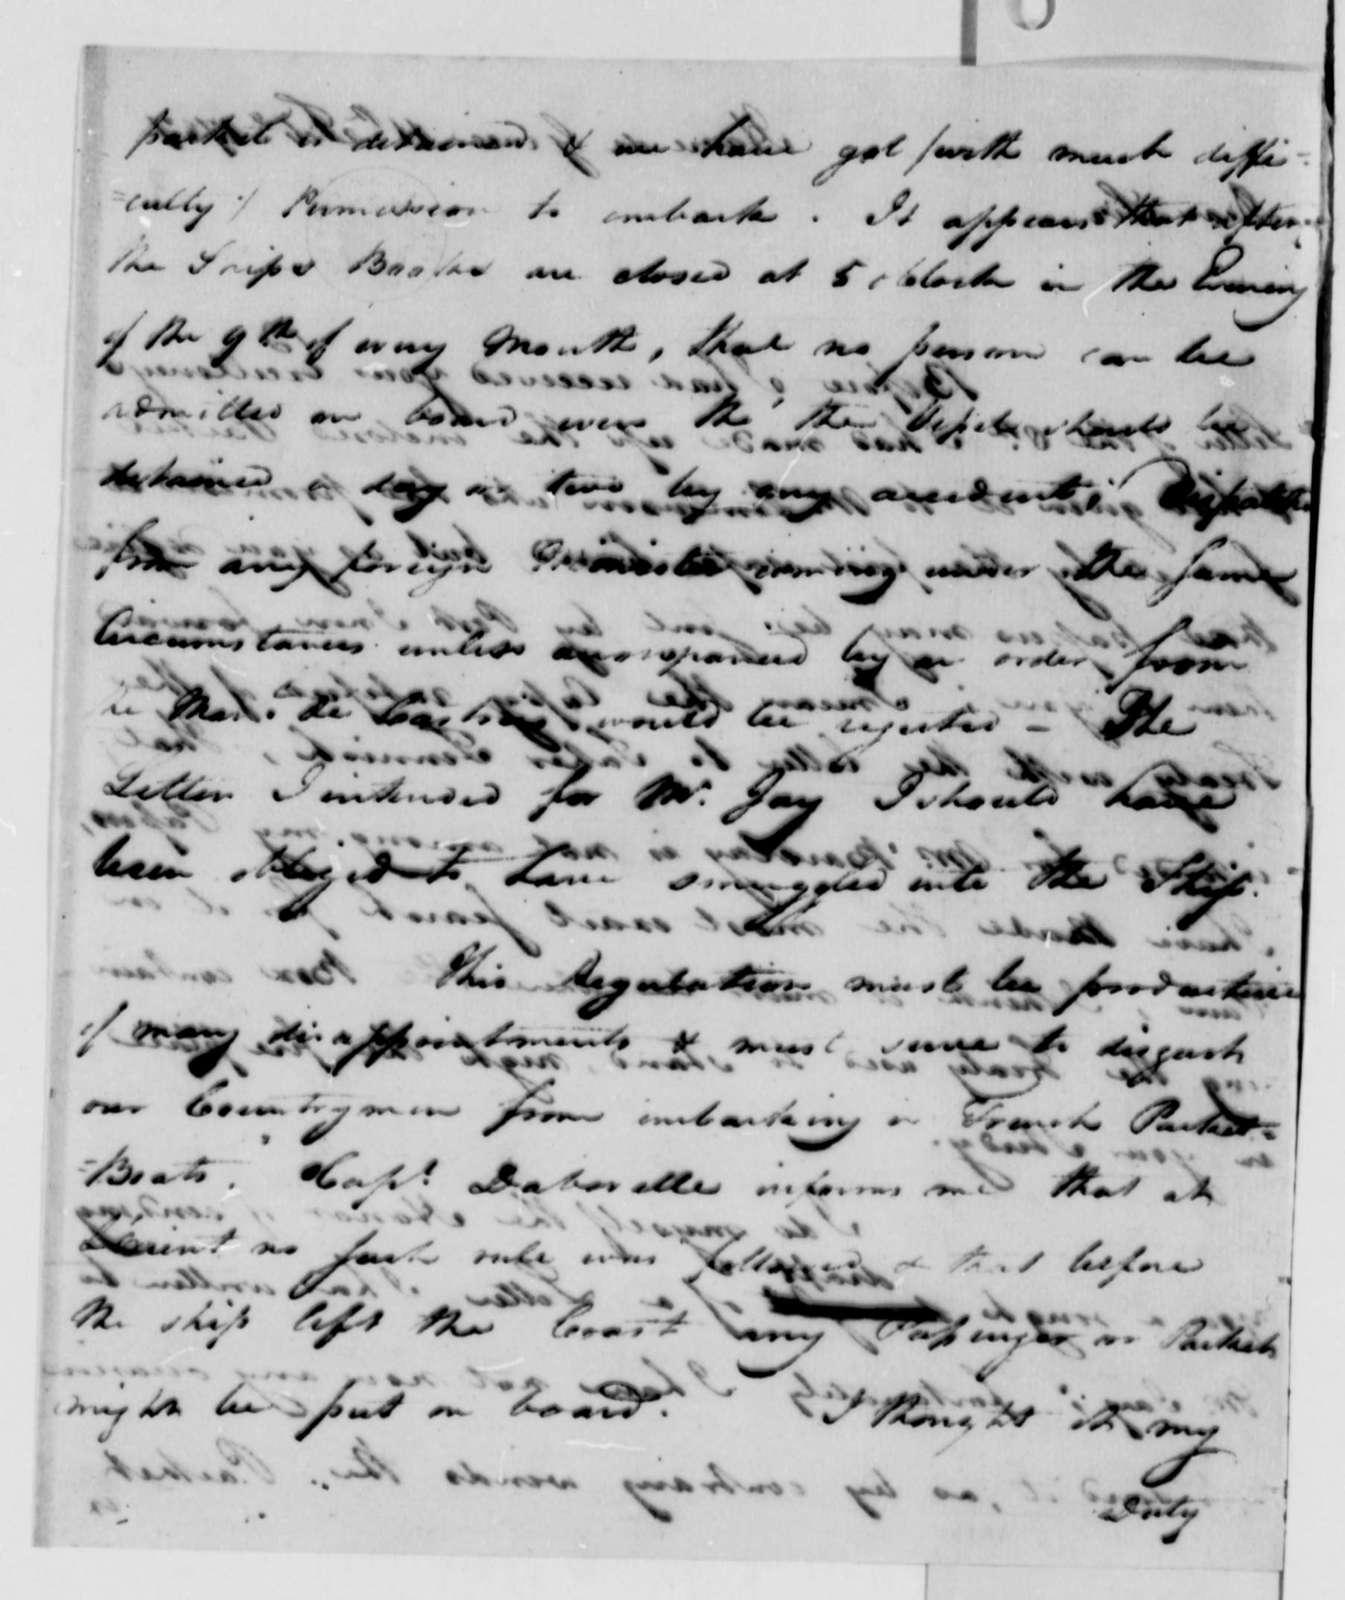 David S. Franks to Thomas Jefferson, February 11, 1787